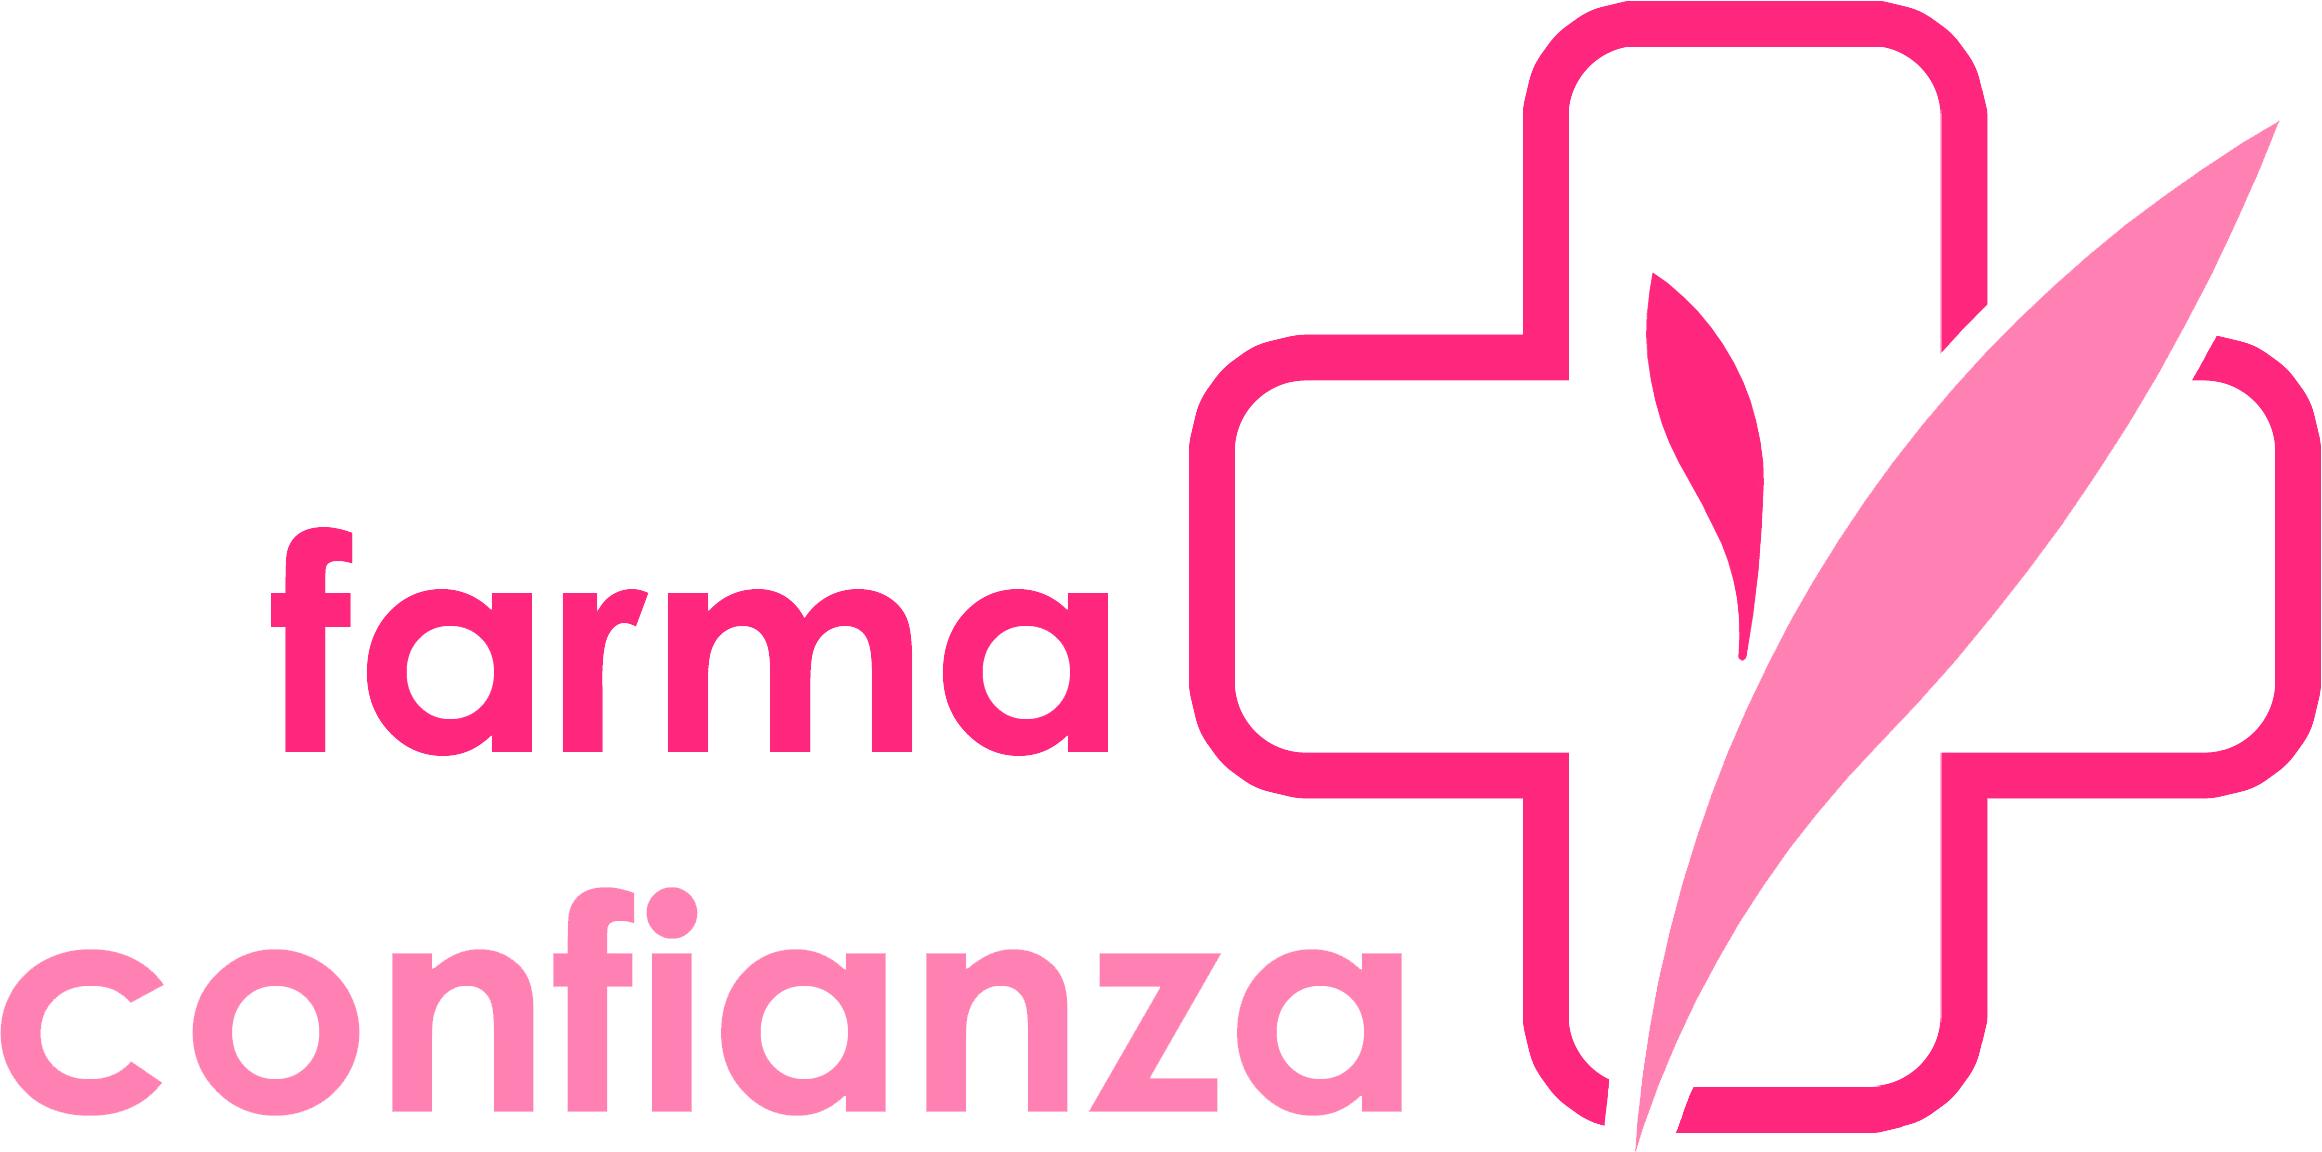 Farmaconfianza logo